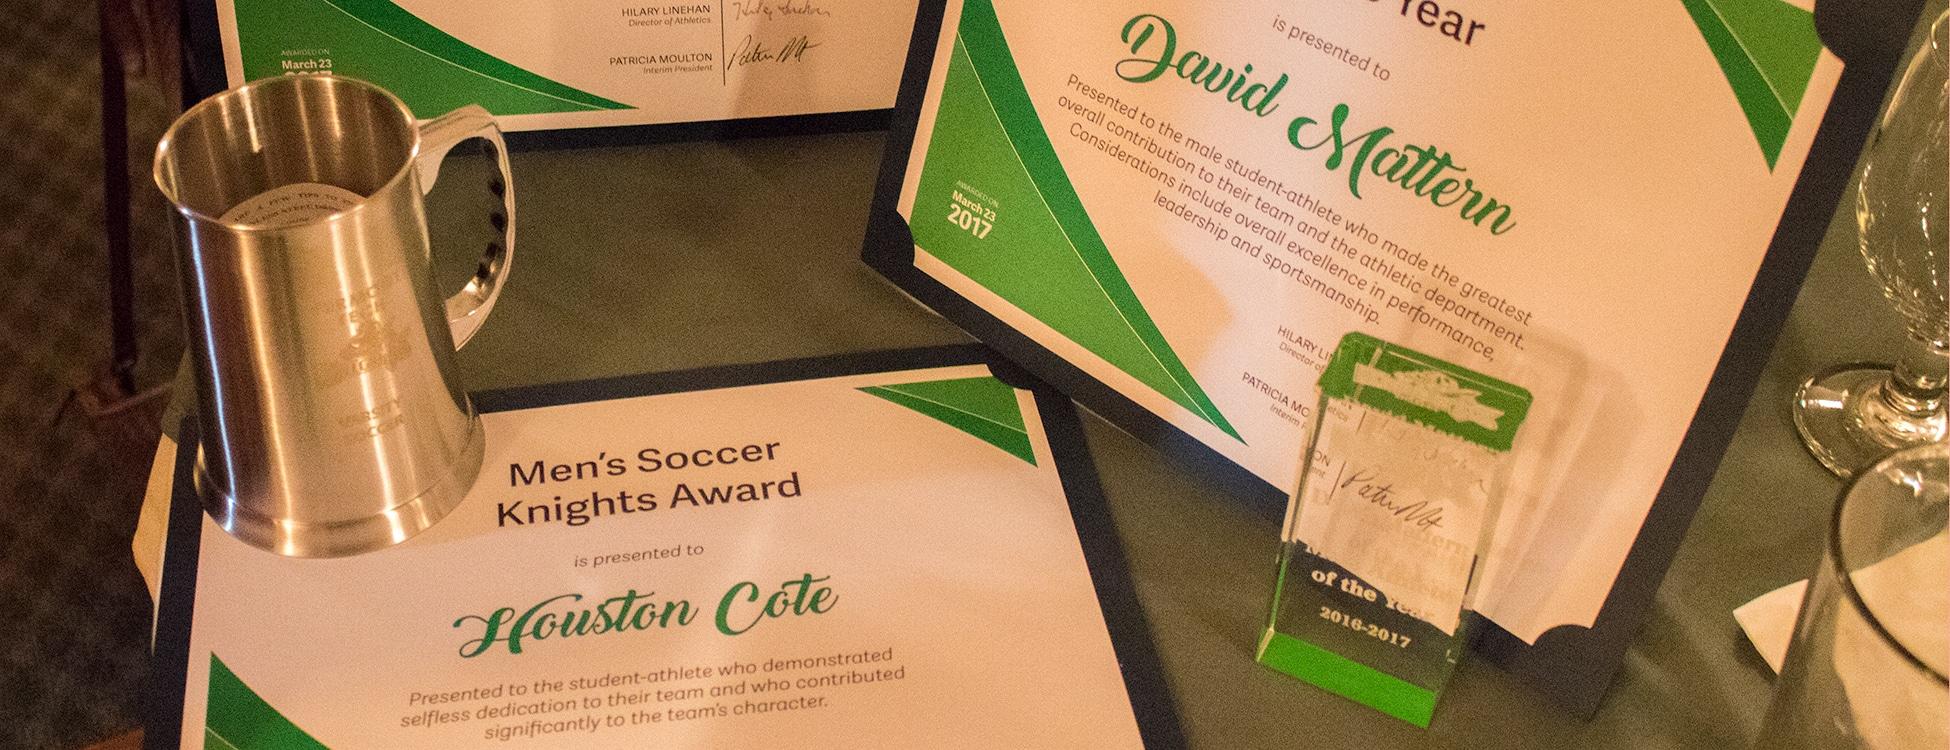 athletic awards, knights, student award winners